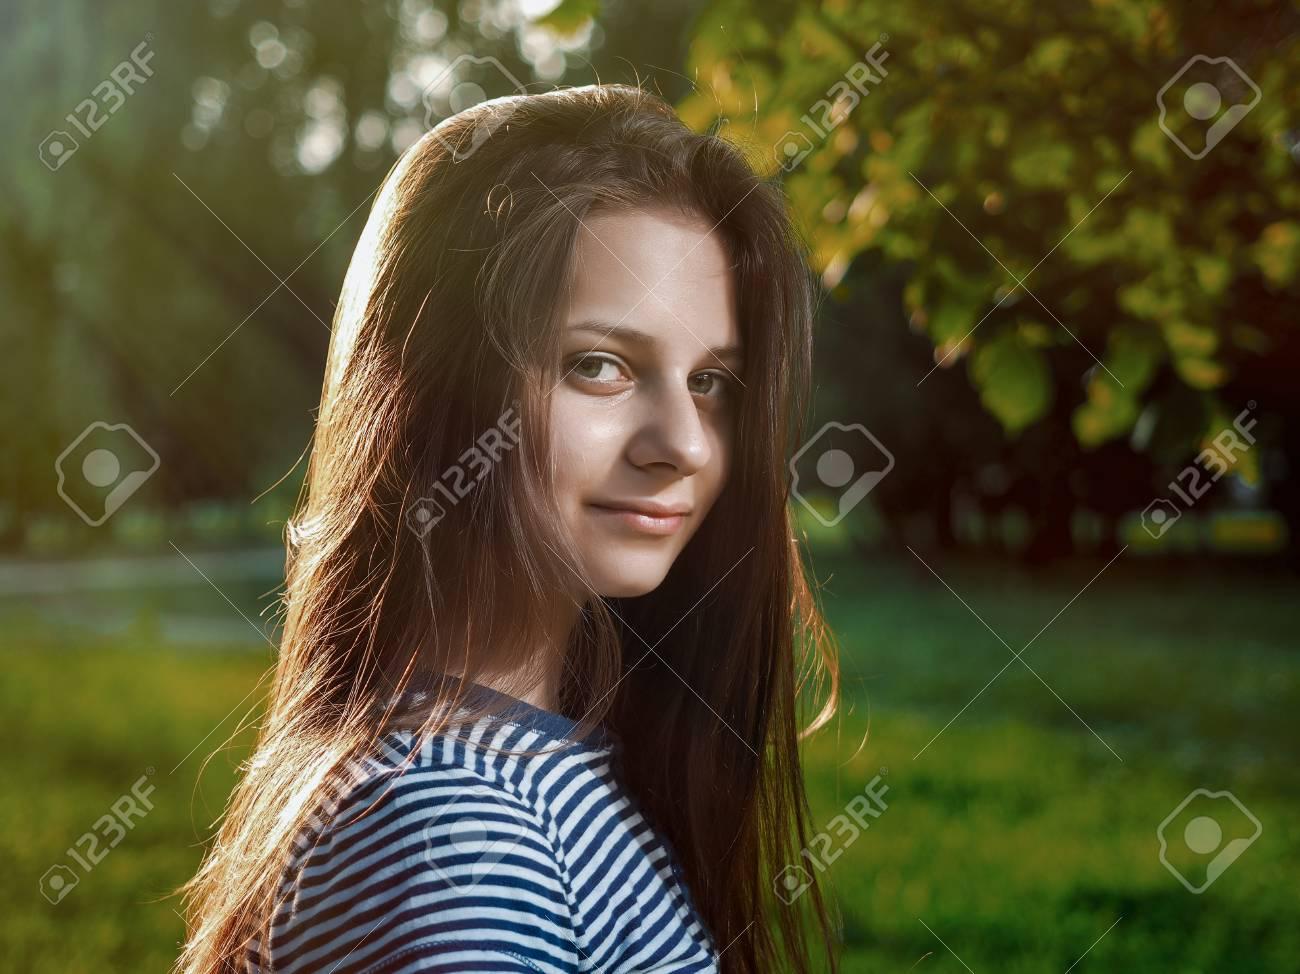 Braune haare natur